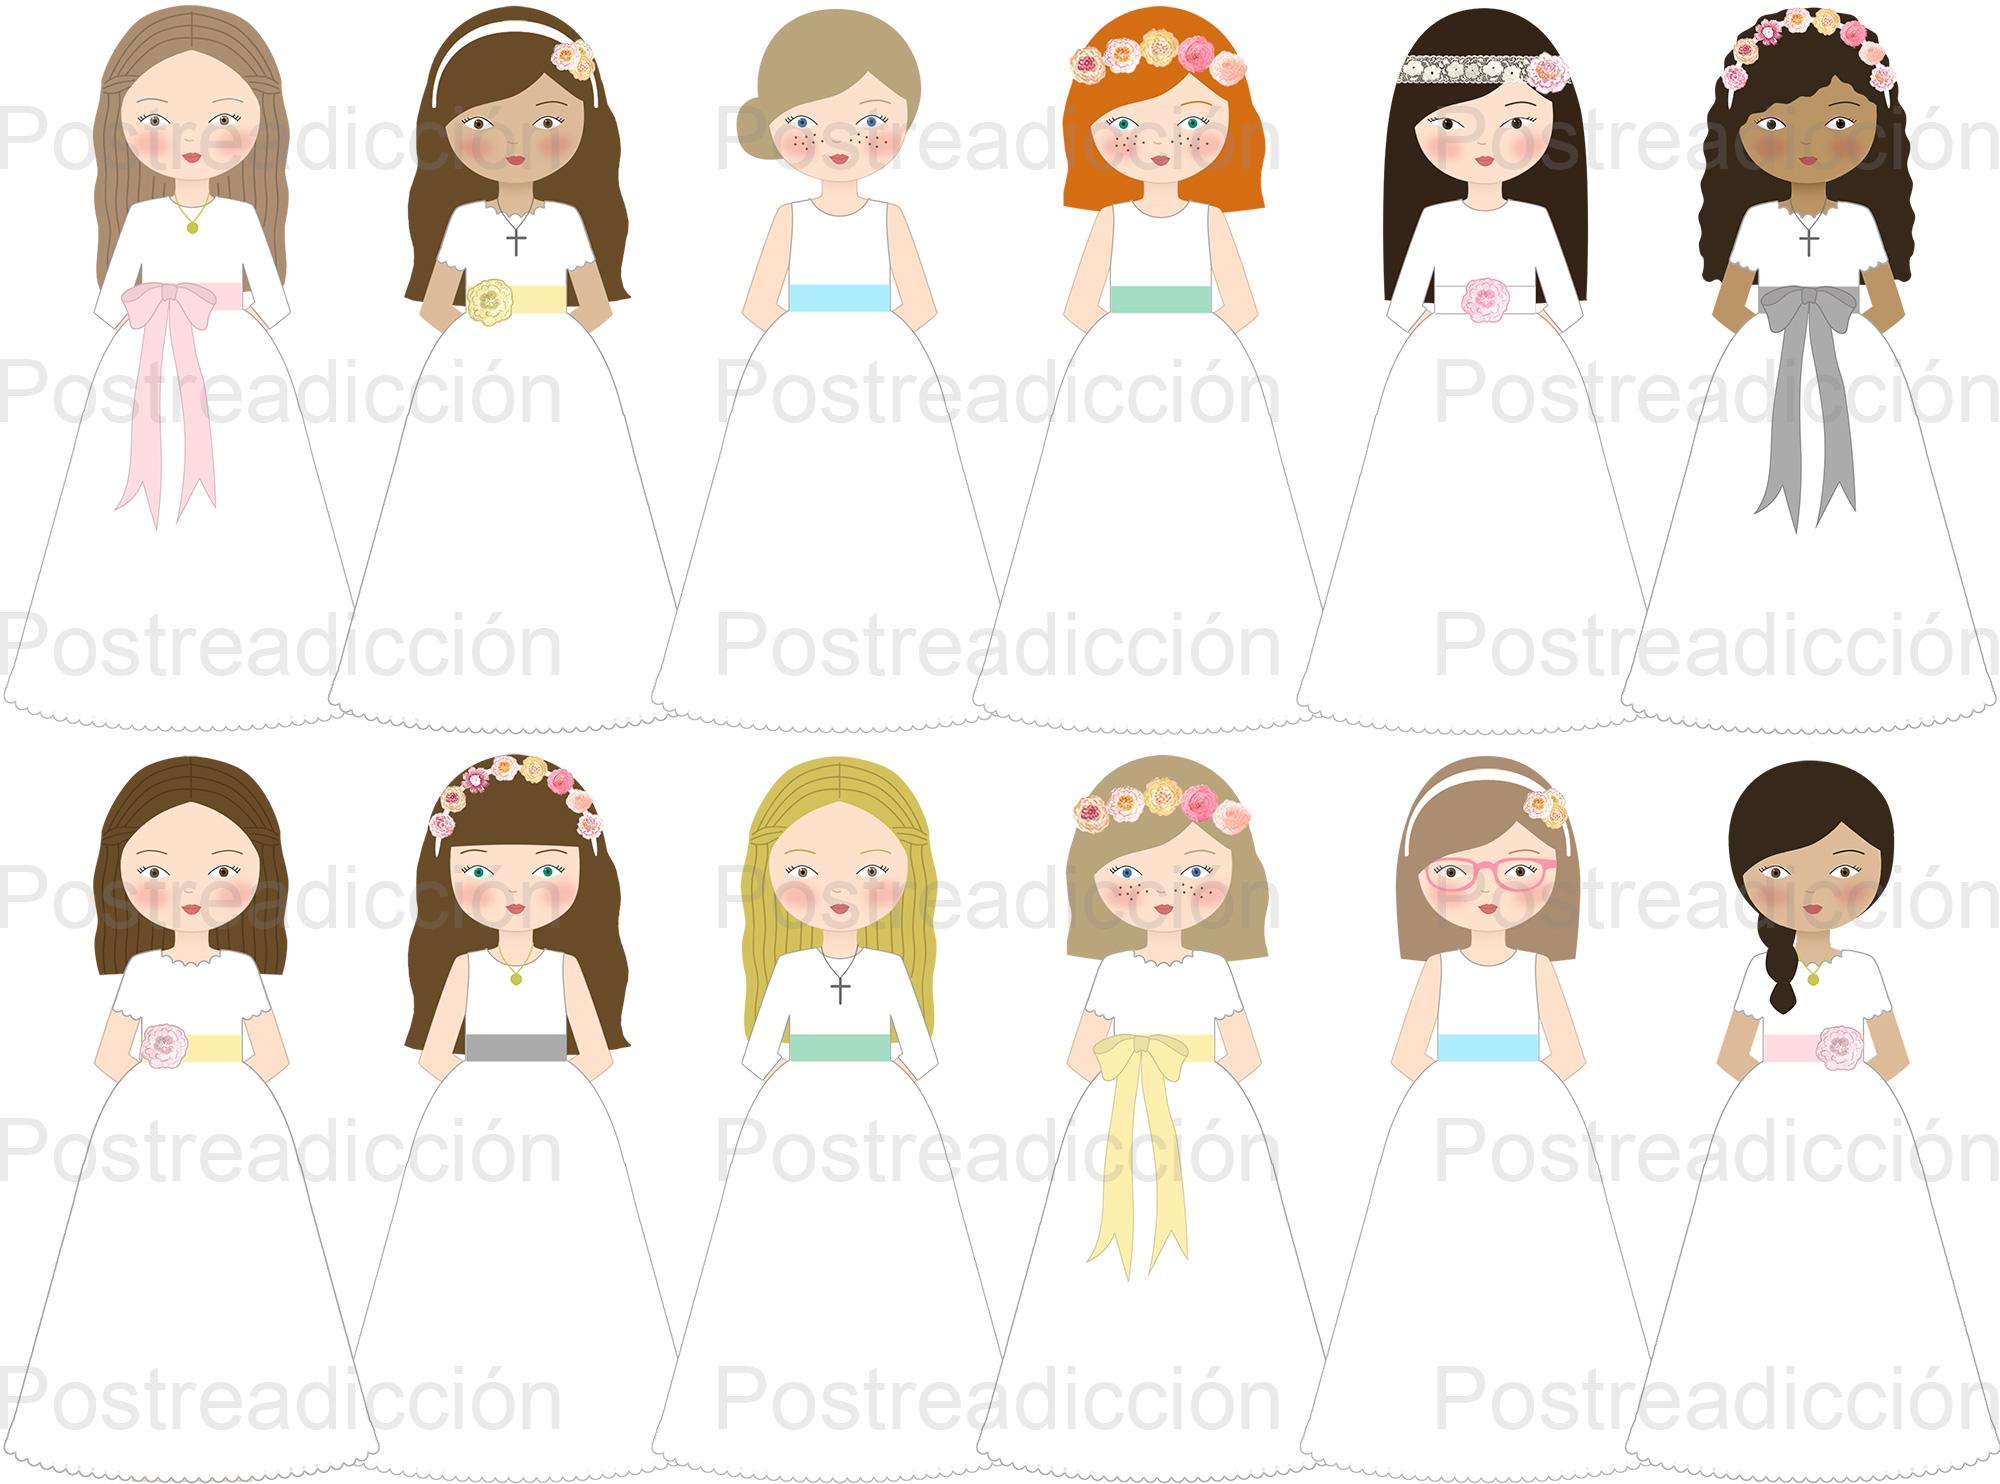 Imagen de producto: https://tienda.postreadiccion.com/img/articulos/secundarias13204-10-kitkats-de-comunion-carlota-3.jpg